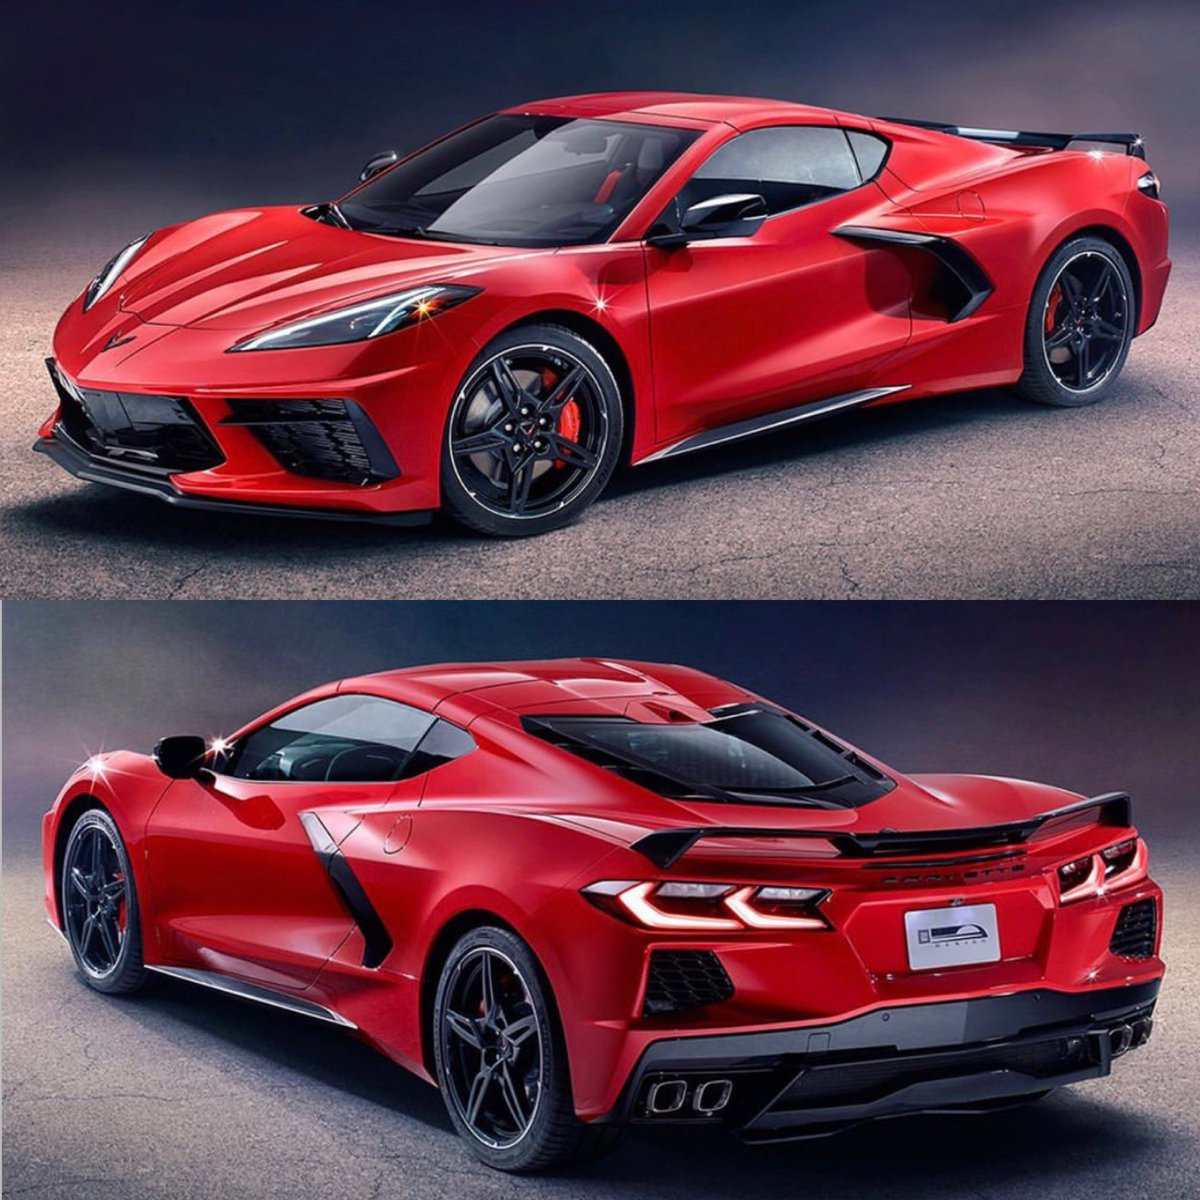 2020 Los Angeles Auto Show.Los Angeles Auto Show Nov 22 Dec 1 On Twitter It S